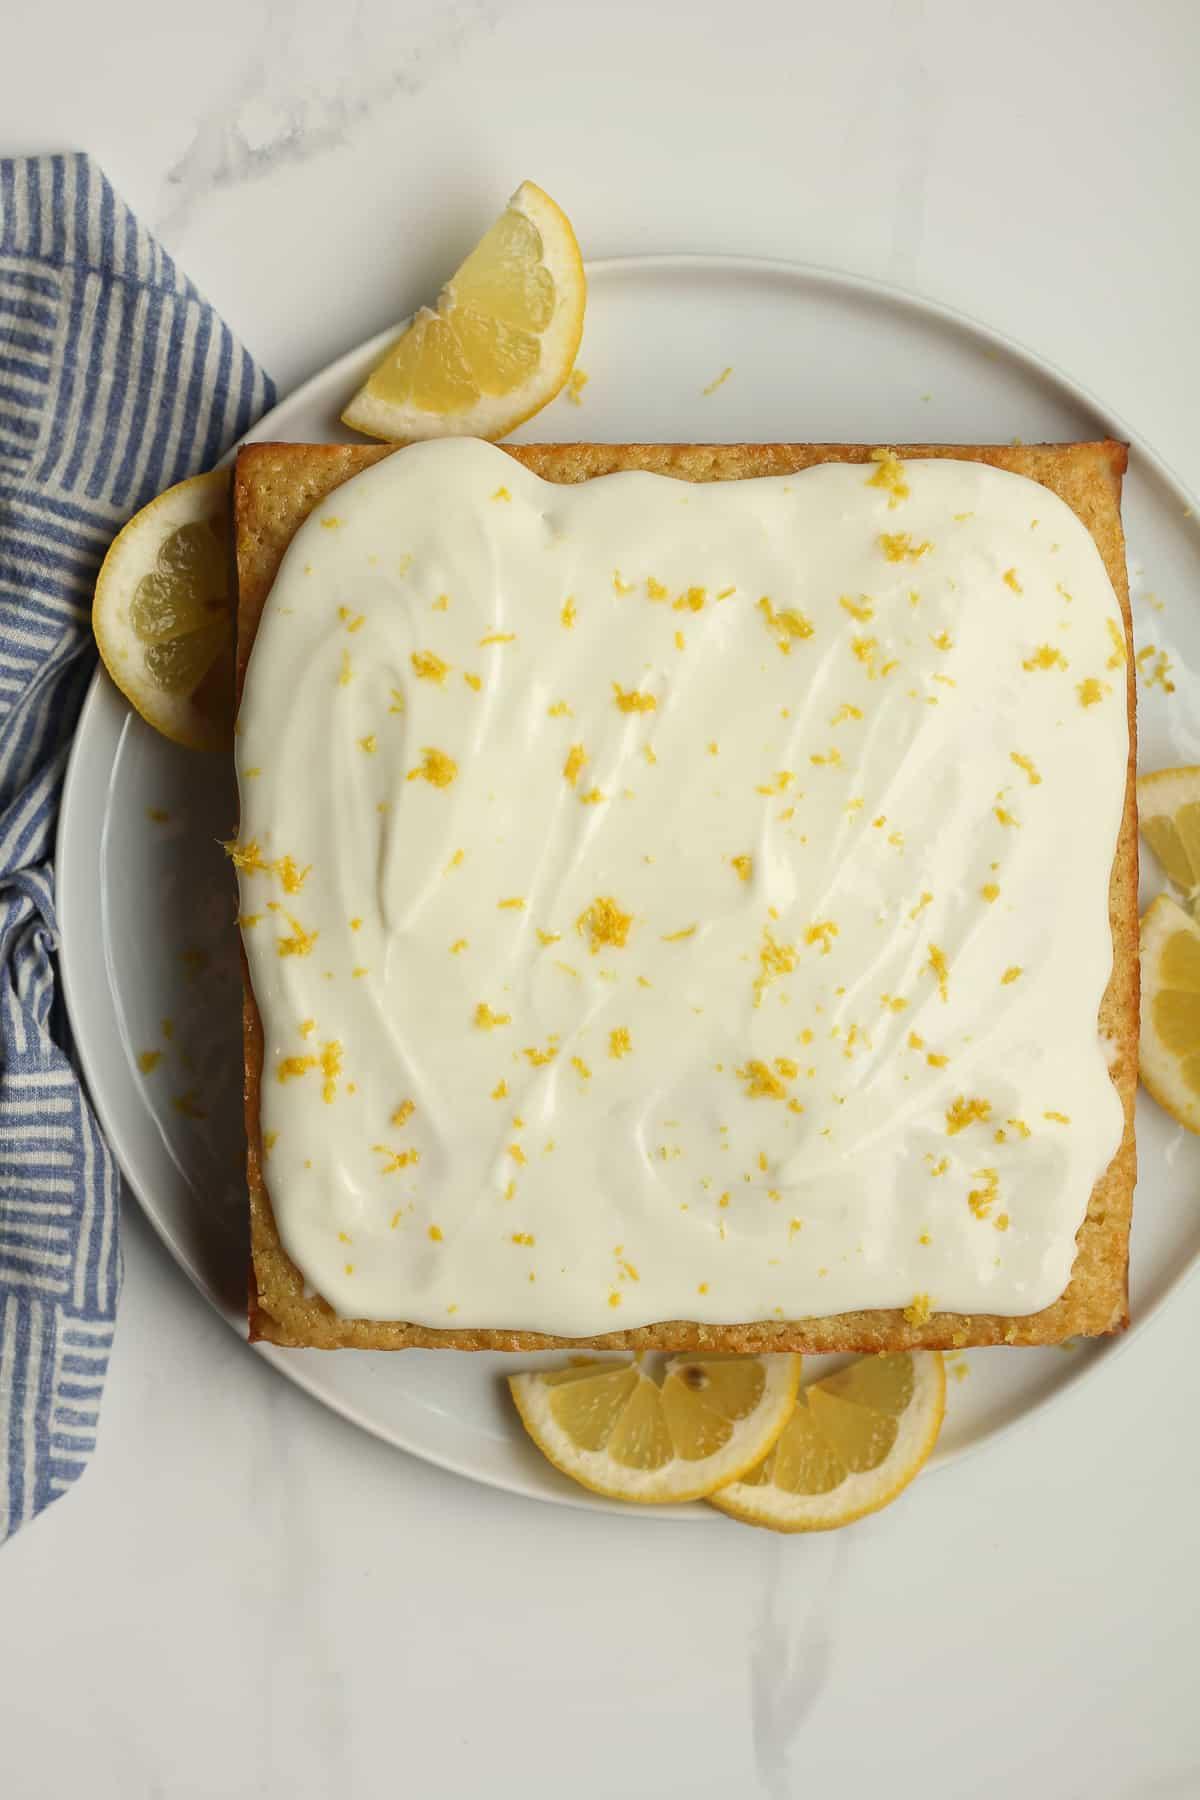 A square lemon cake from scratch with lemon zest.